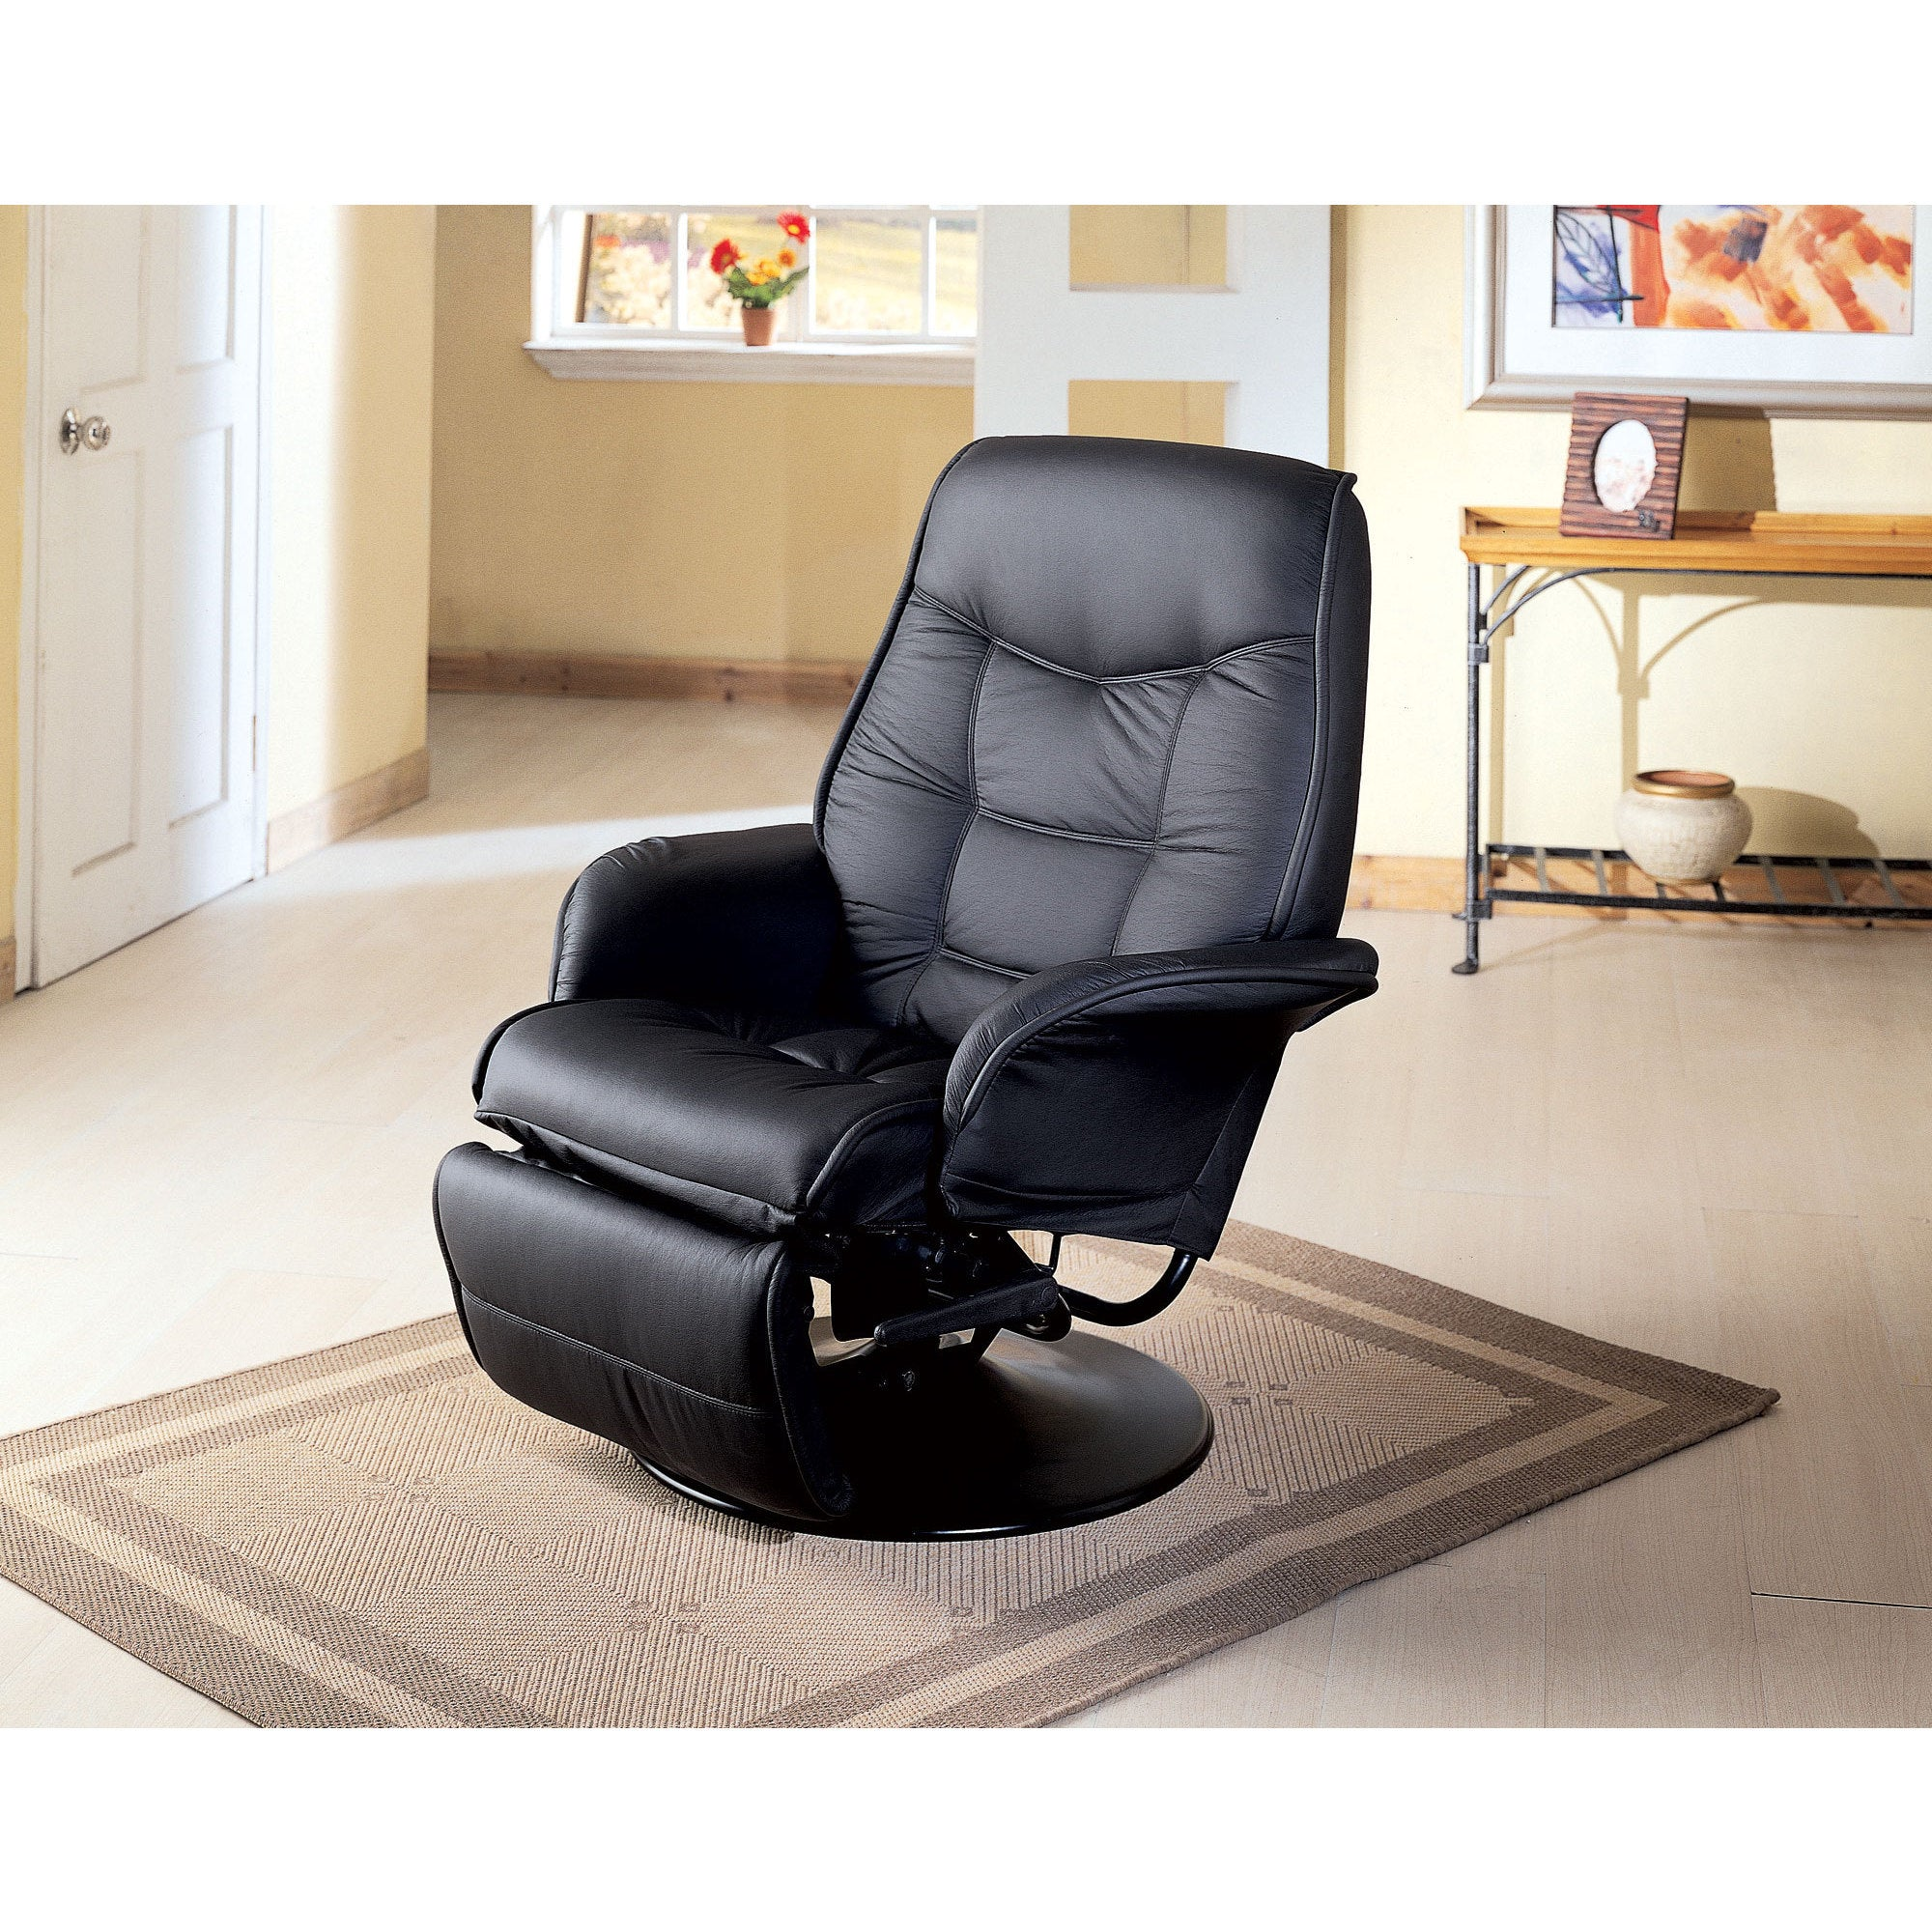 Coaster Furniture Berri Leatherette Swivel Recliner in Black by Coaster - 7501